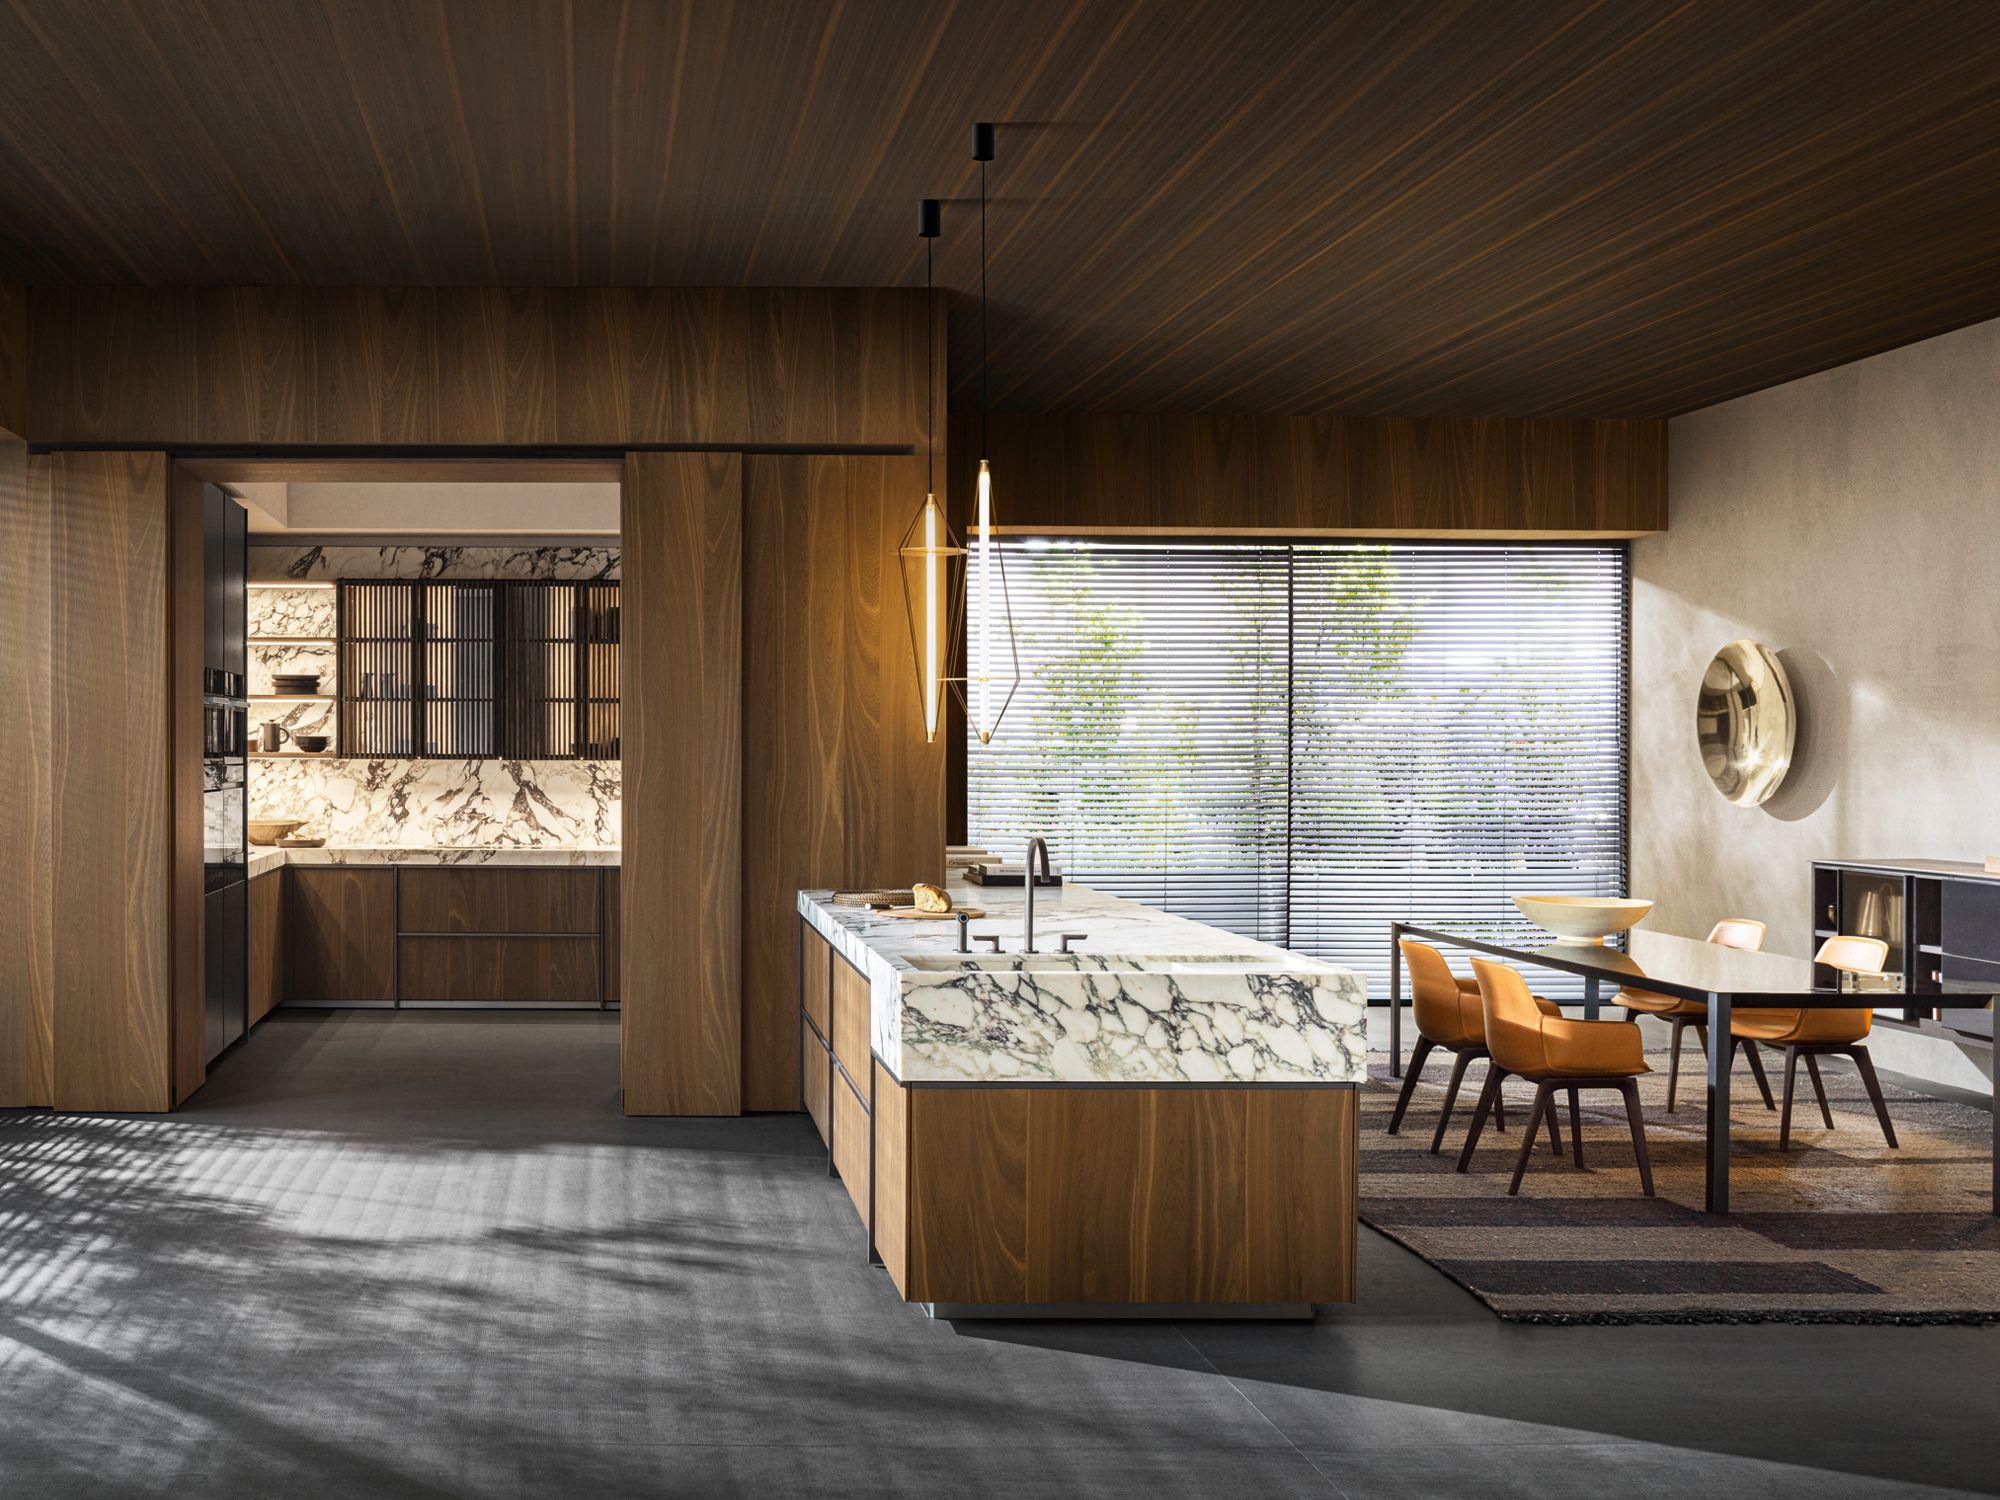 Dada Sistema 7 kitchen system by Vincent Van Duysen, from P5